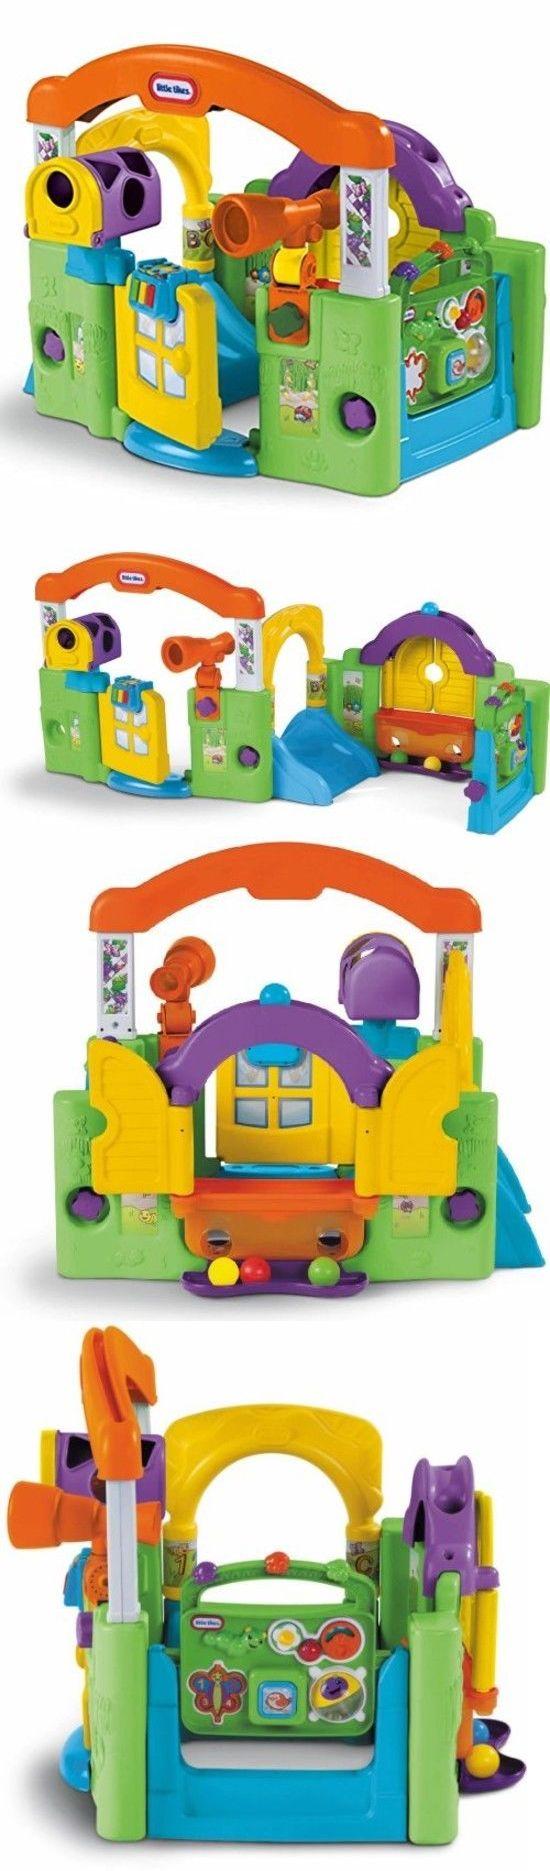 Child Size 2574 Little Tikes Activity Garden Baby Playset